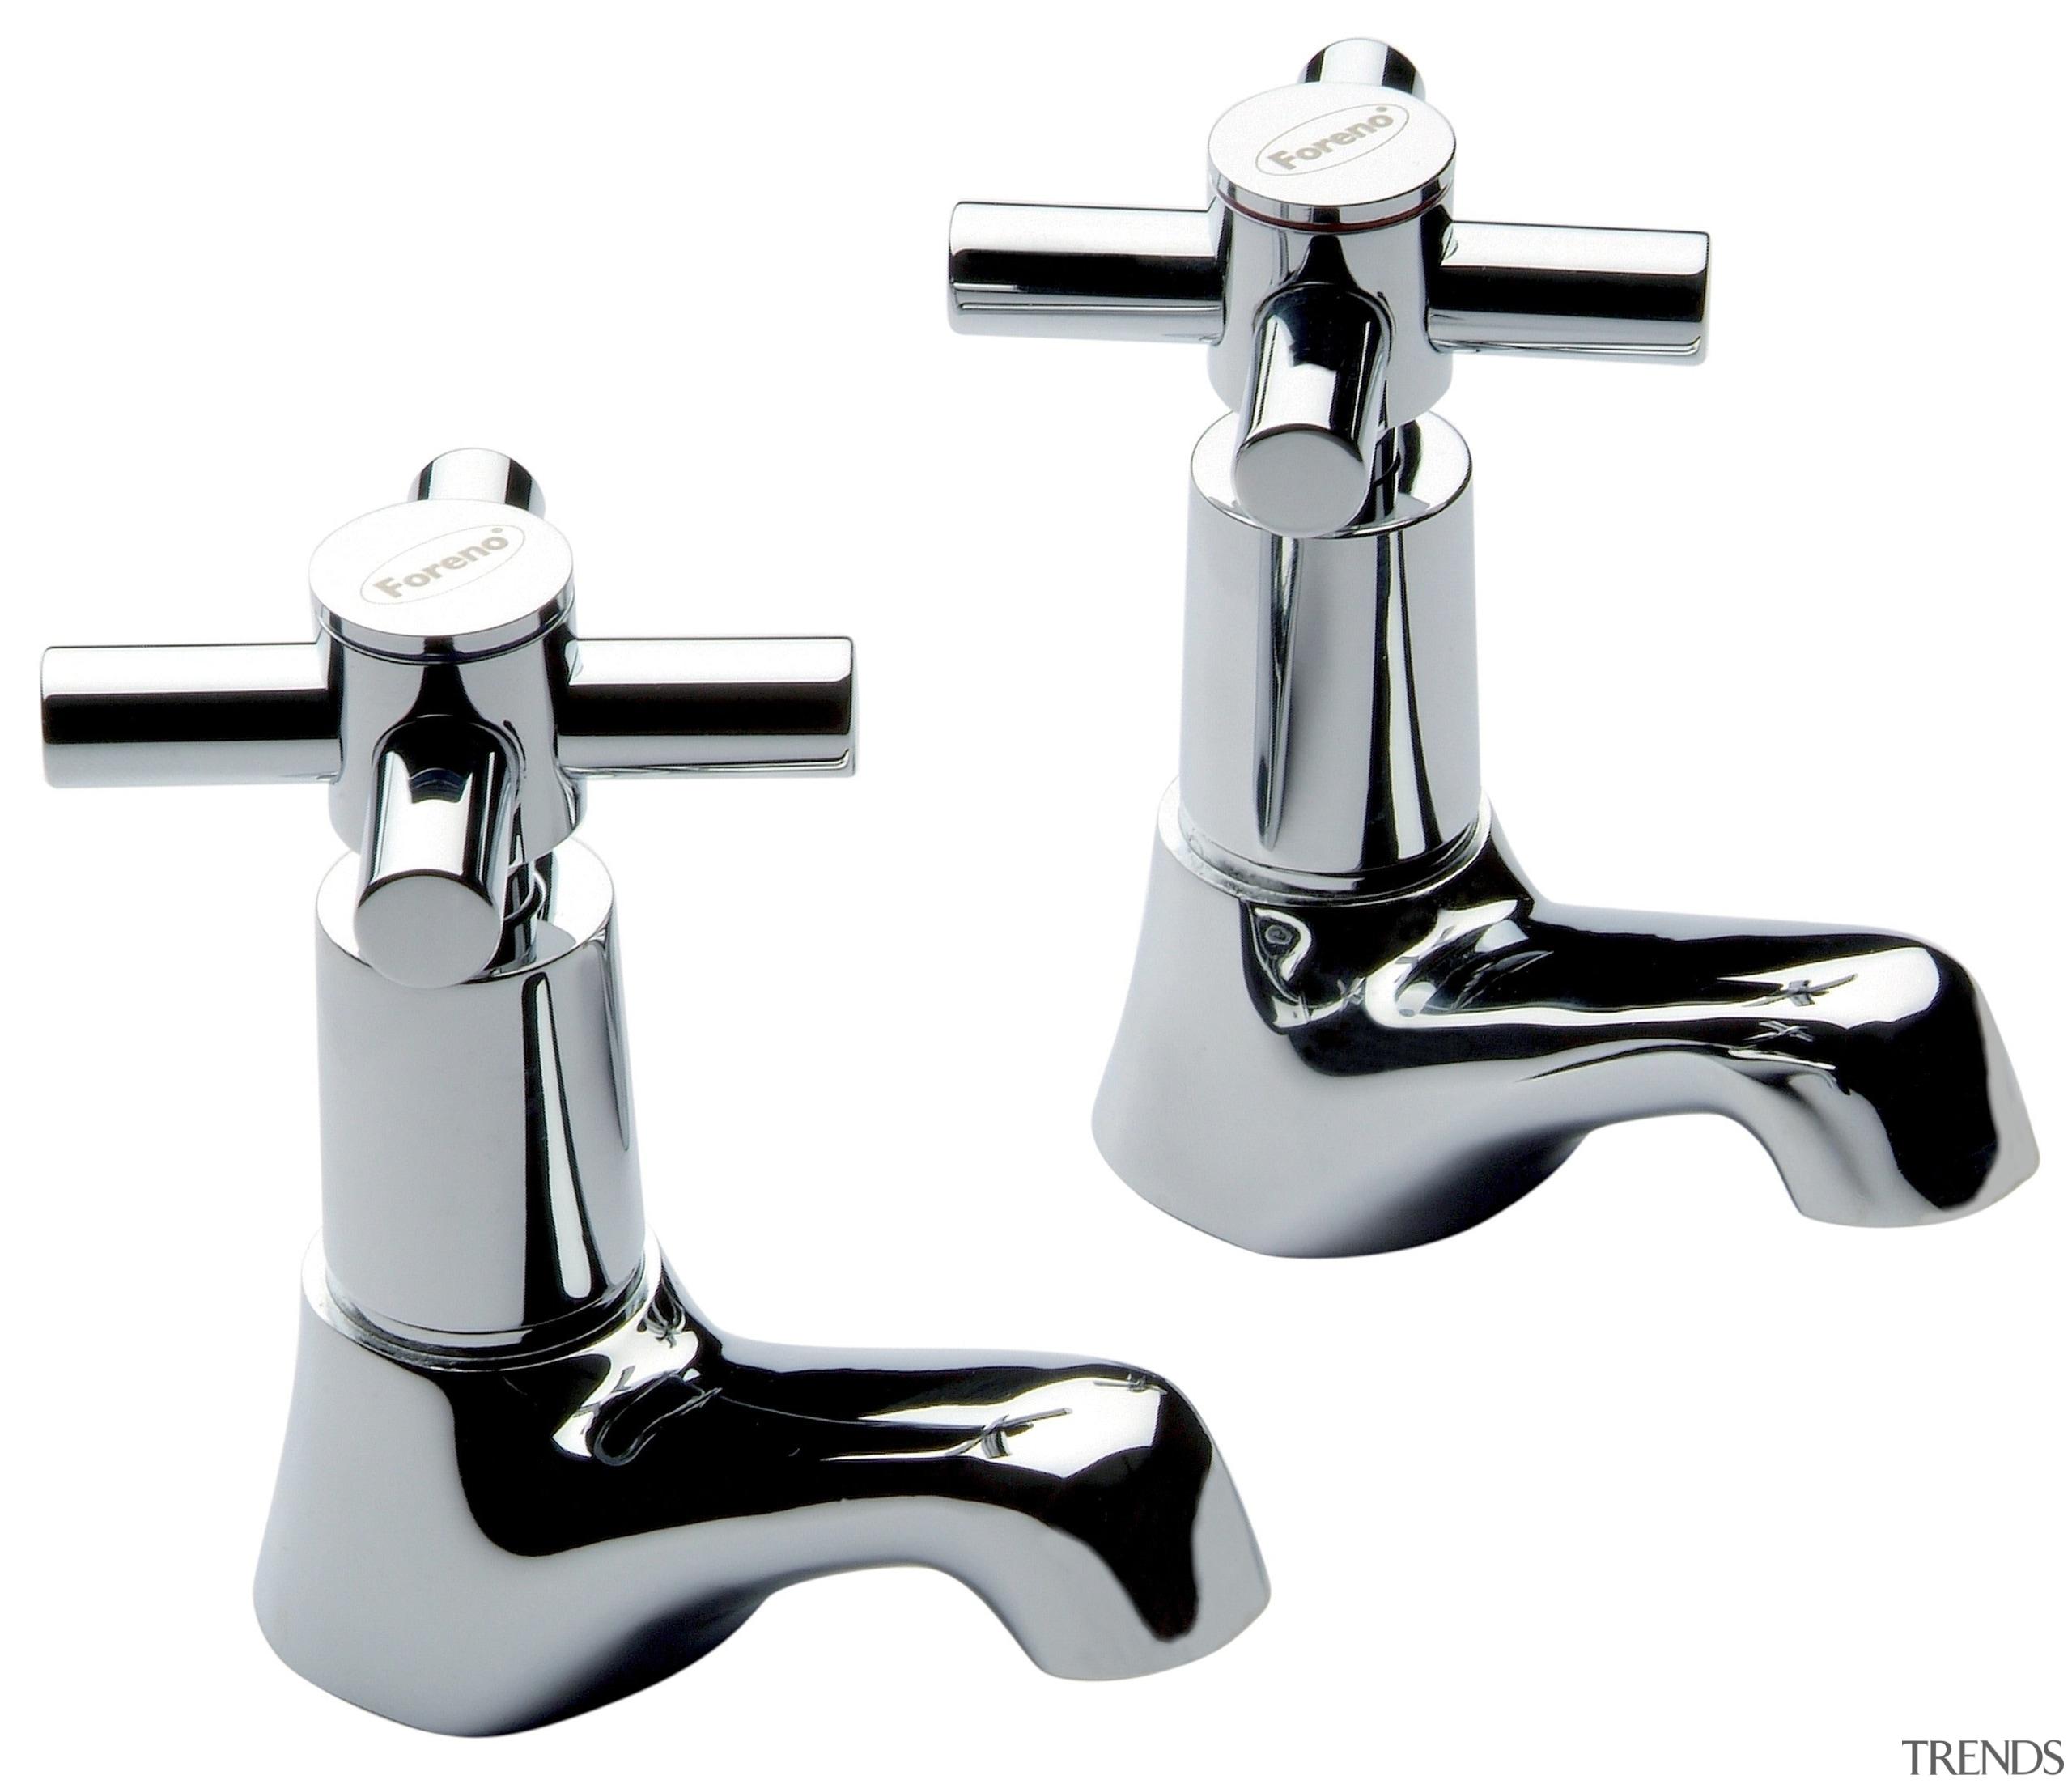 X-Factor Basin Taps XFAC2 - X-Factor Basin Taps hardware, plumbing fixture, product, tap, white